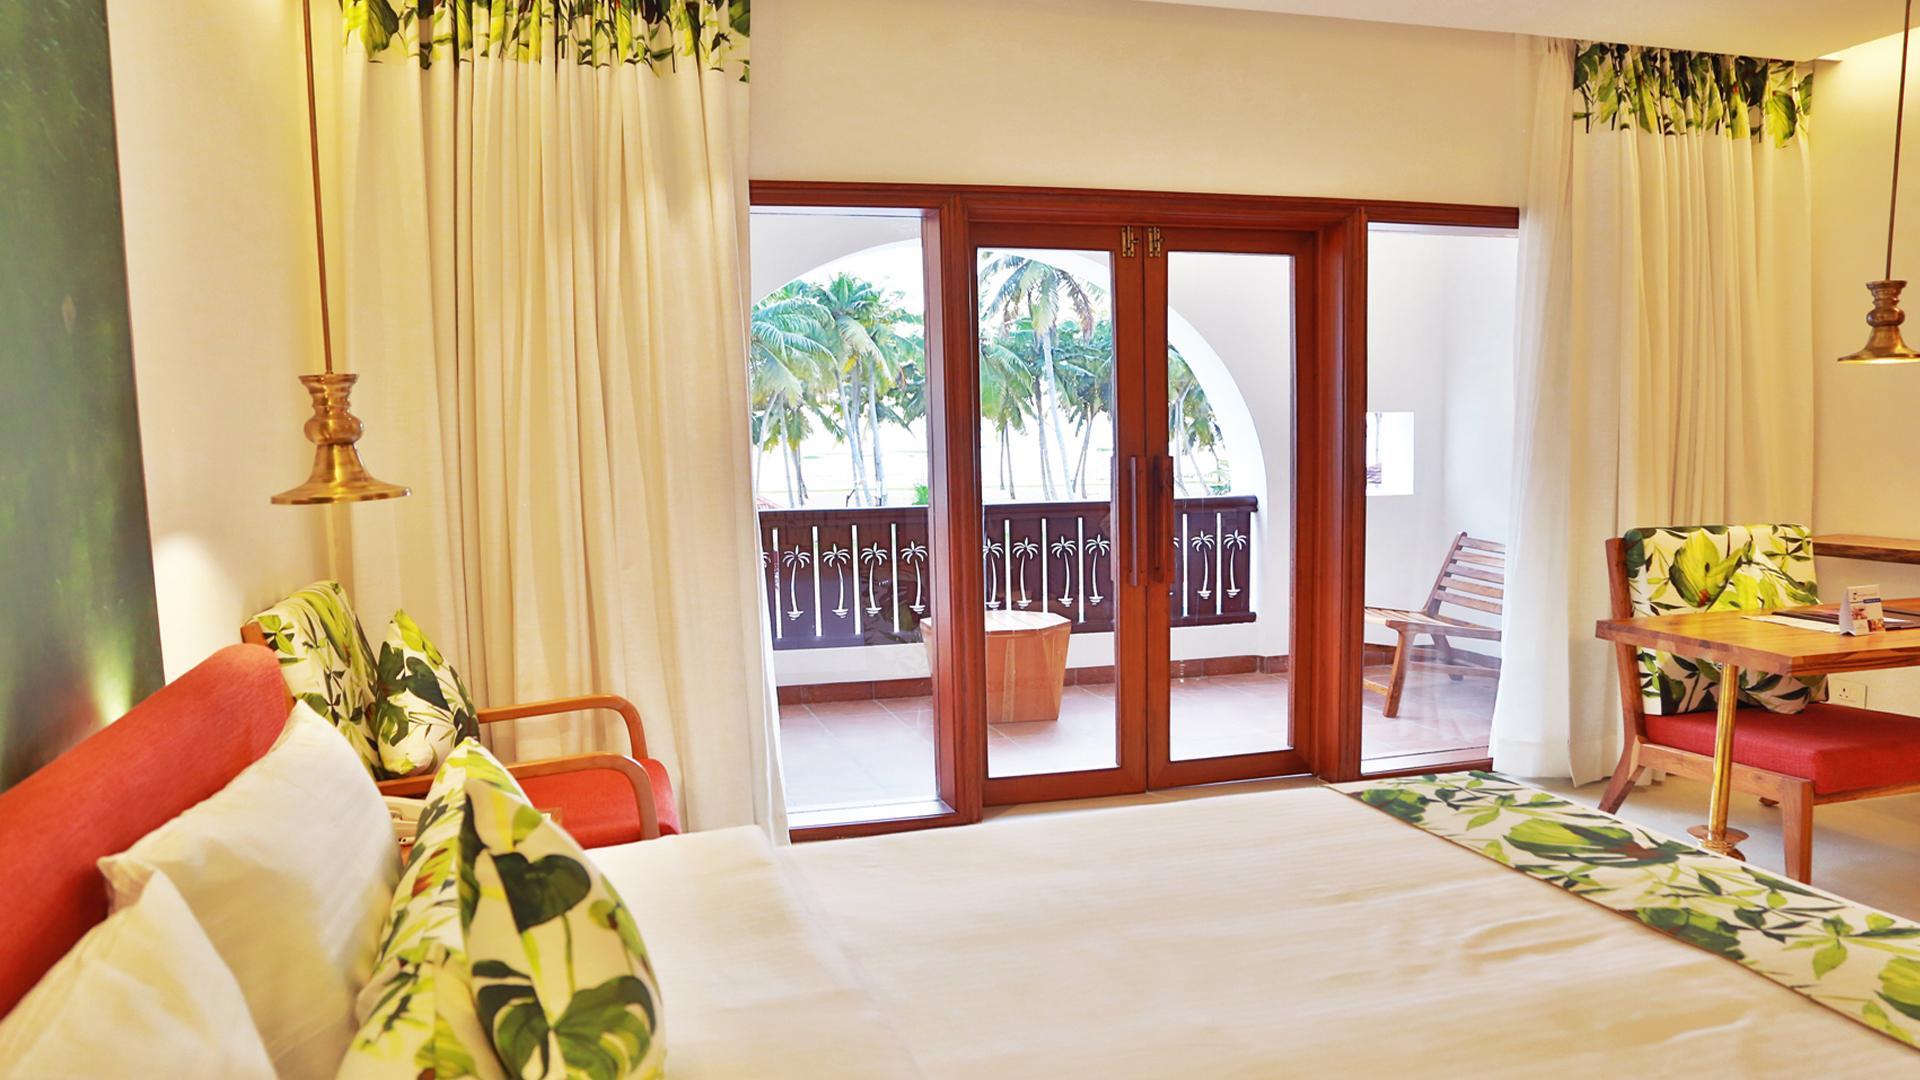 Estuary View Room image 1 at Estuary Sarovar Portico by Thiruvananthapuram, Kerala, India